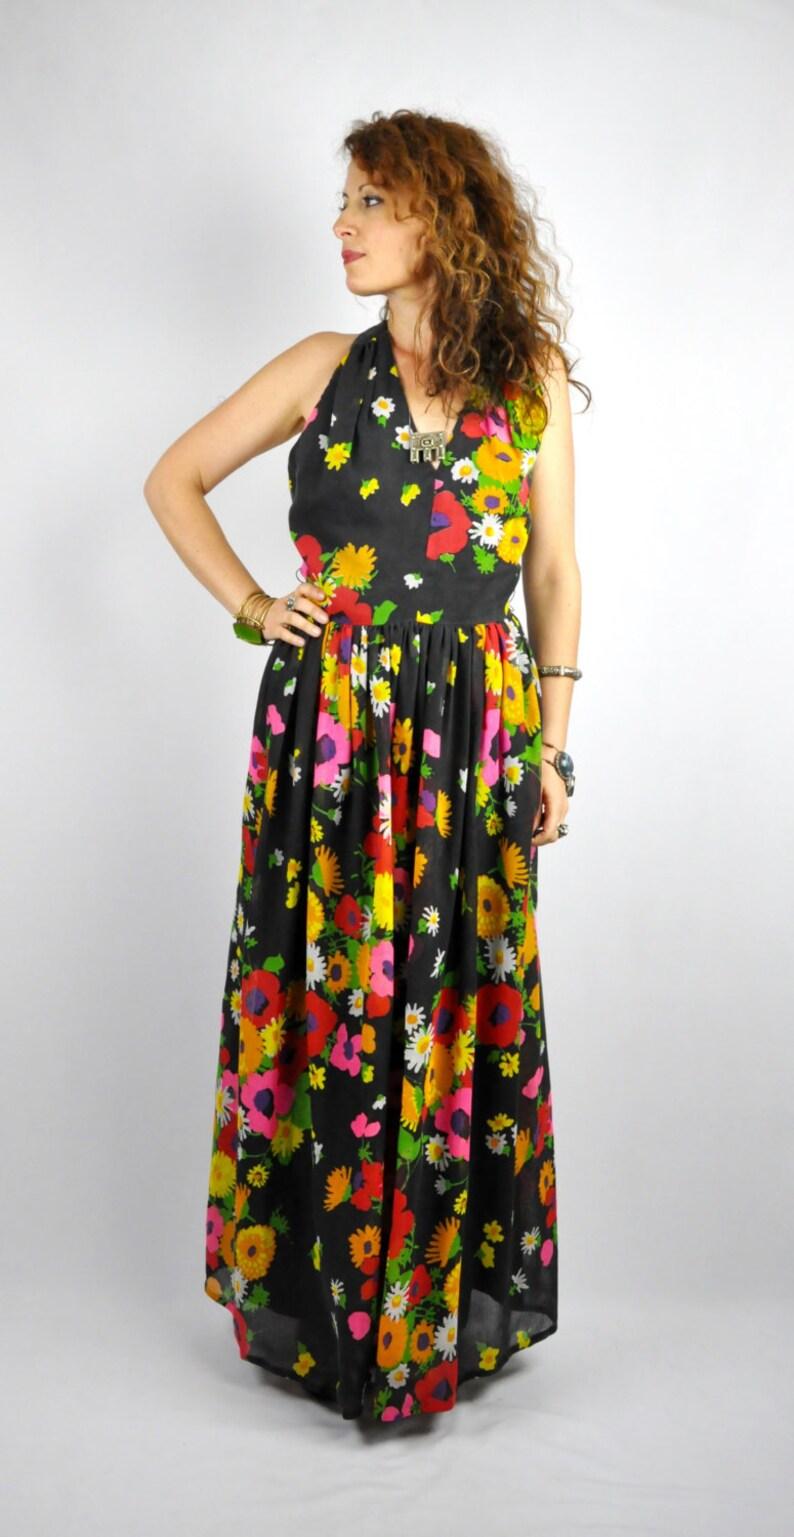 Floor Length Dress M Halter Dress Floral Maxi Dress Boho Gypsy Hippie Sundress  S Maxi Dress Halter Dress 70s Maxi Dress